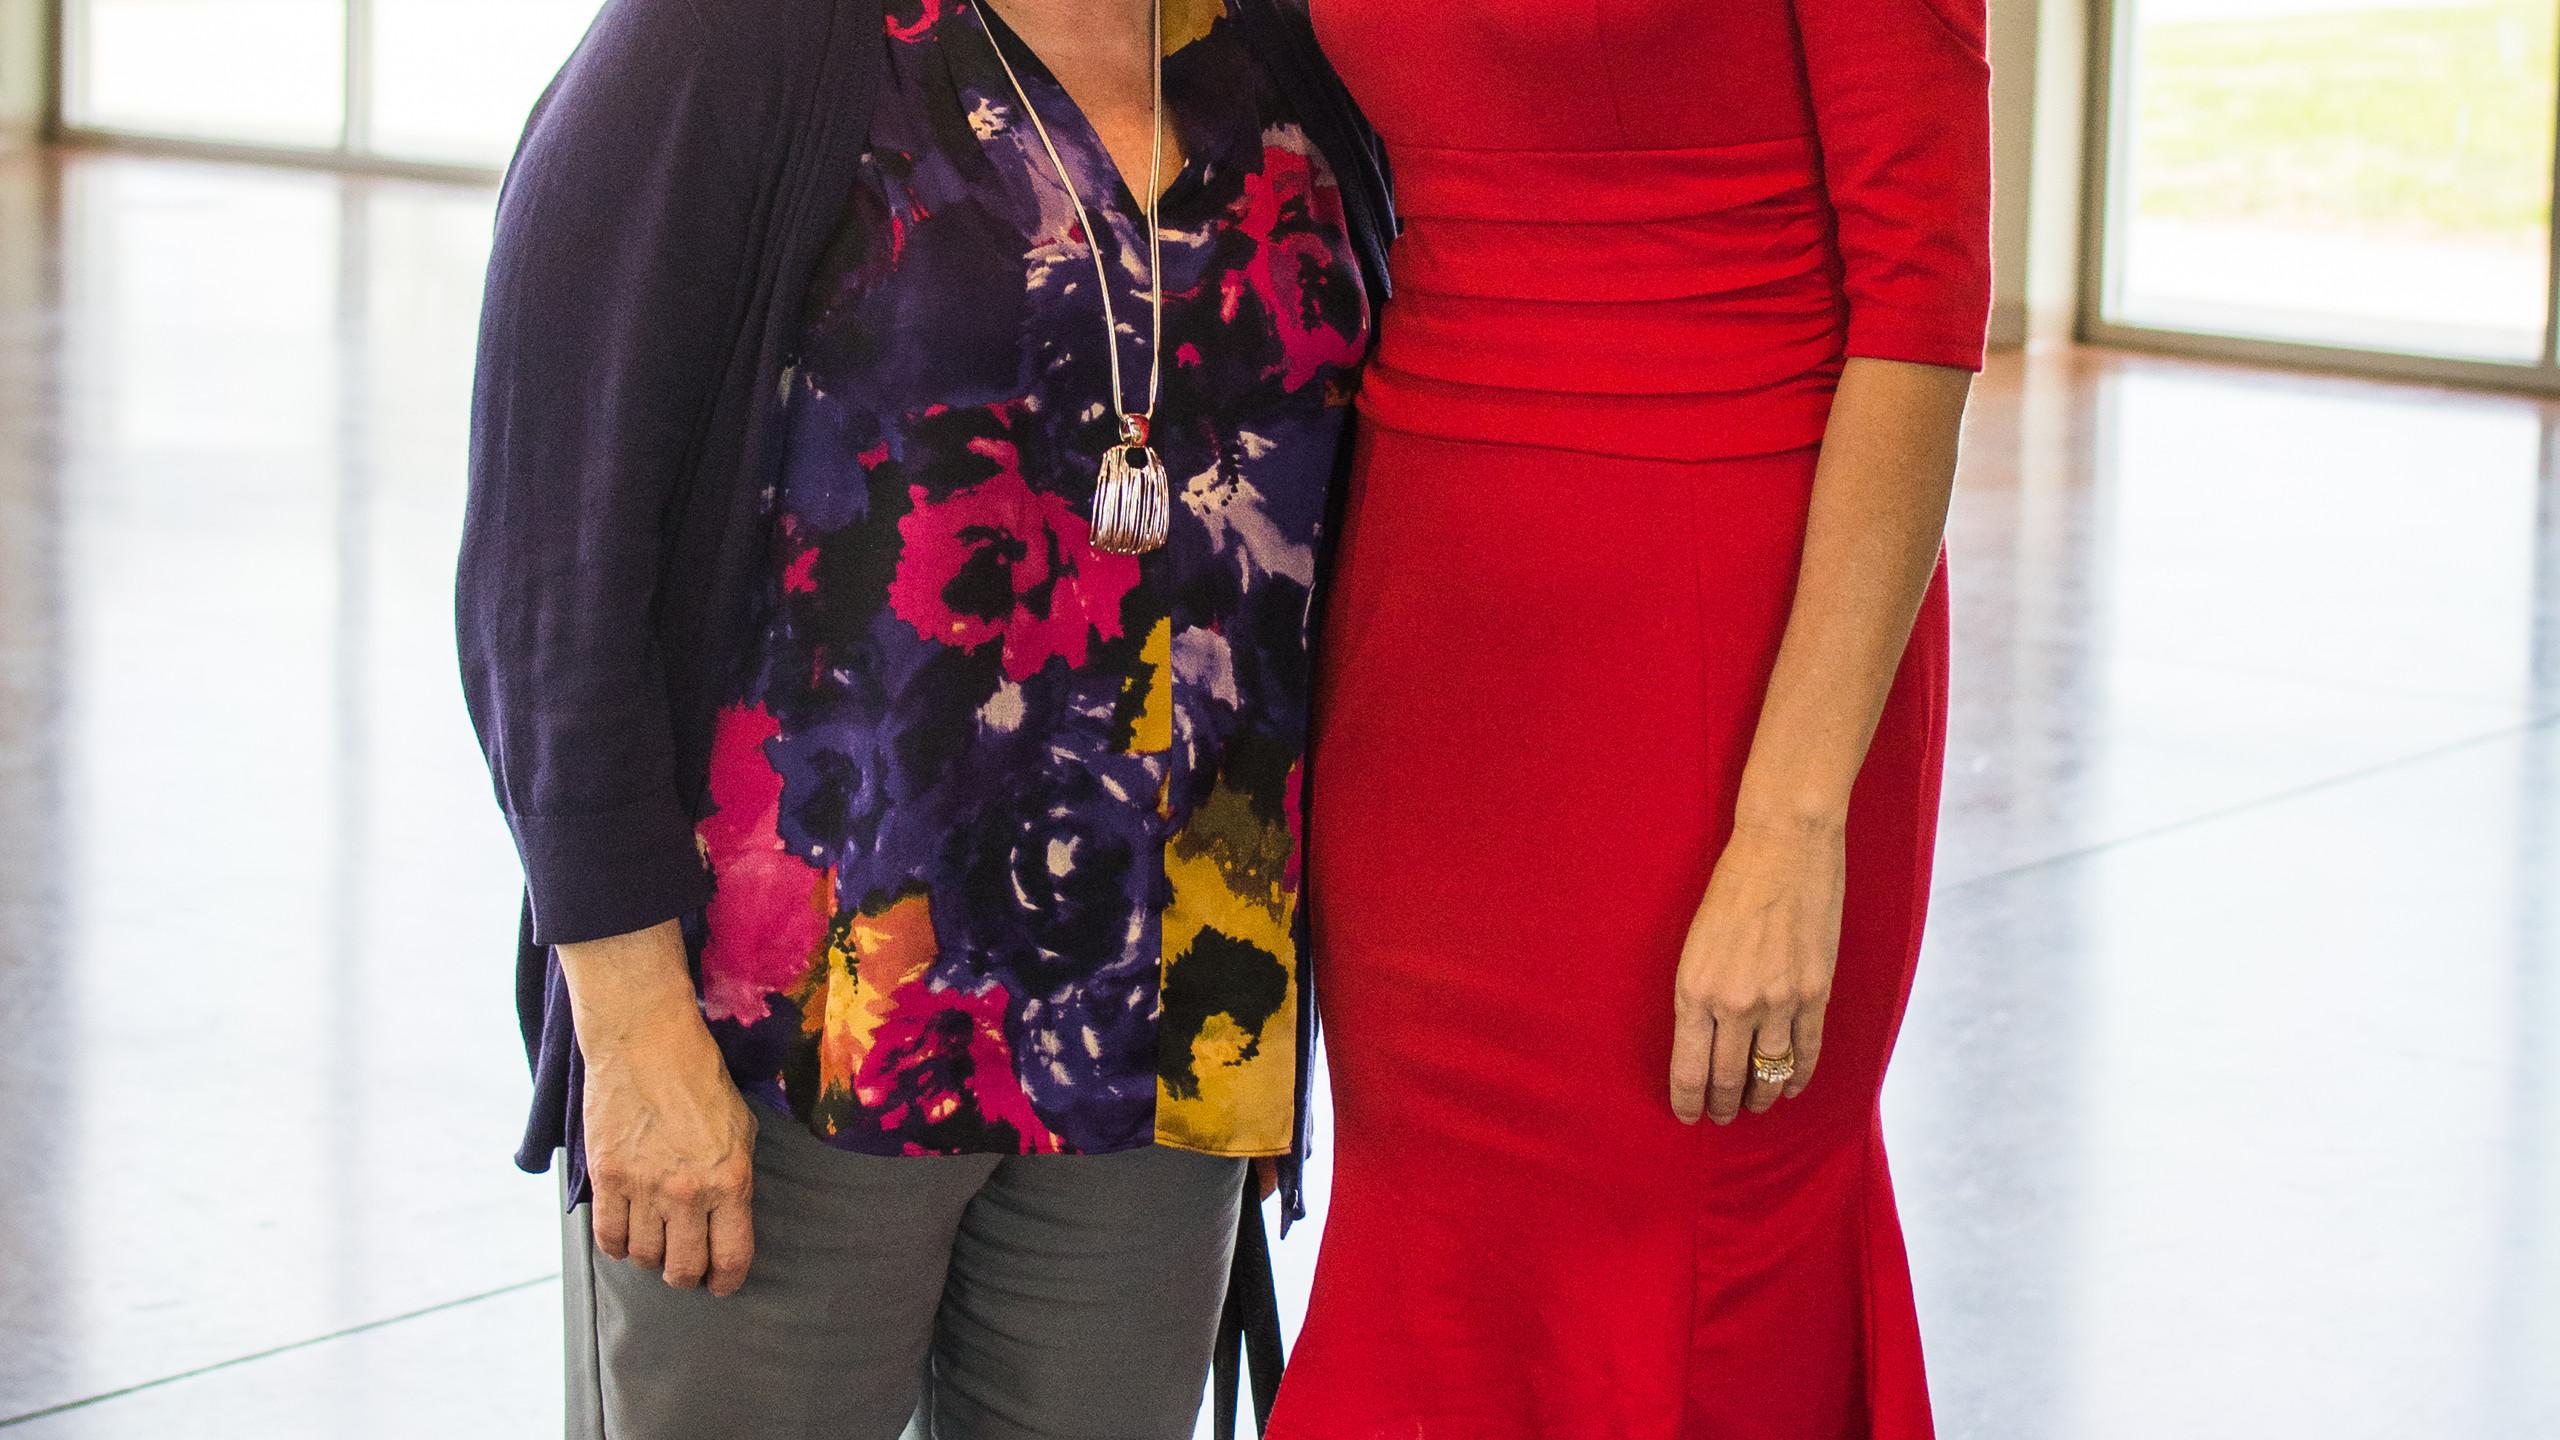 Carol Clark and Ginna Holleman